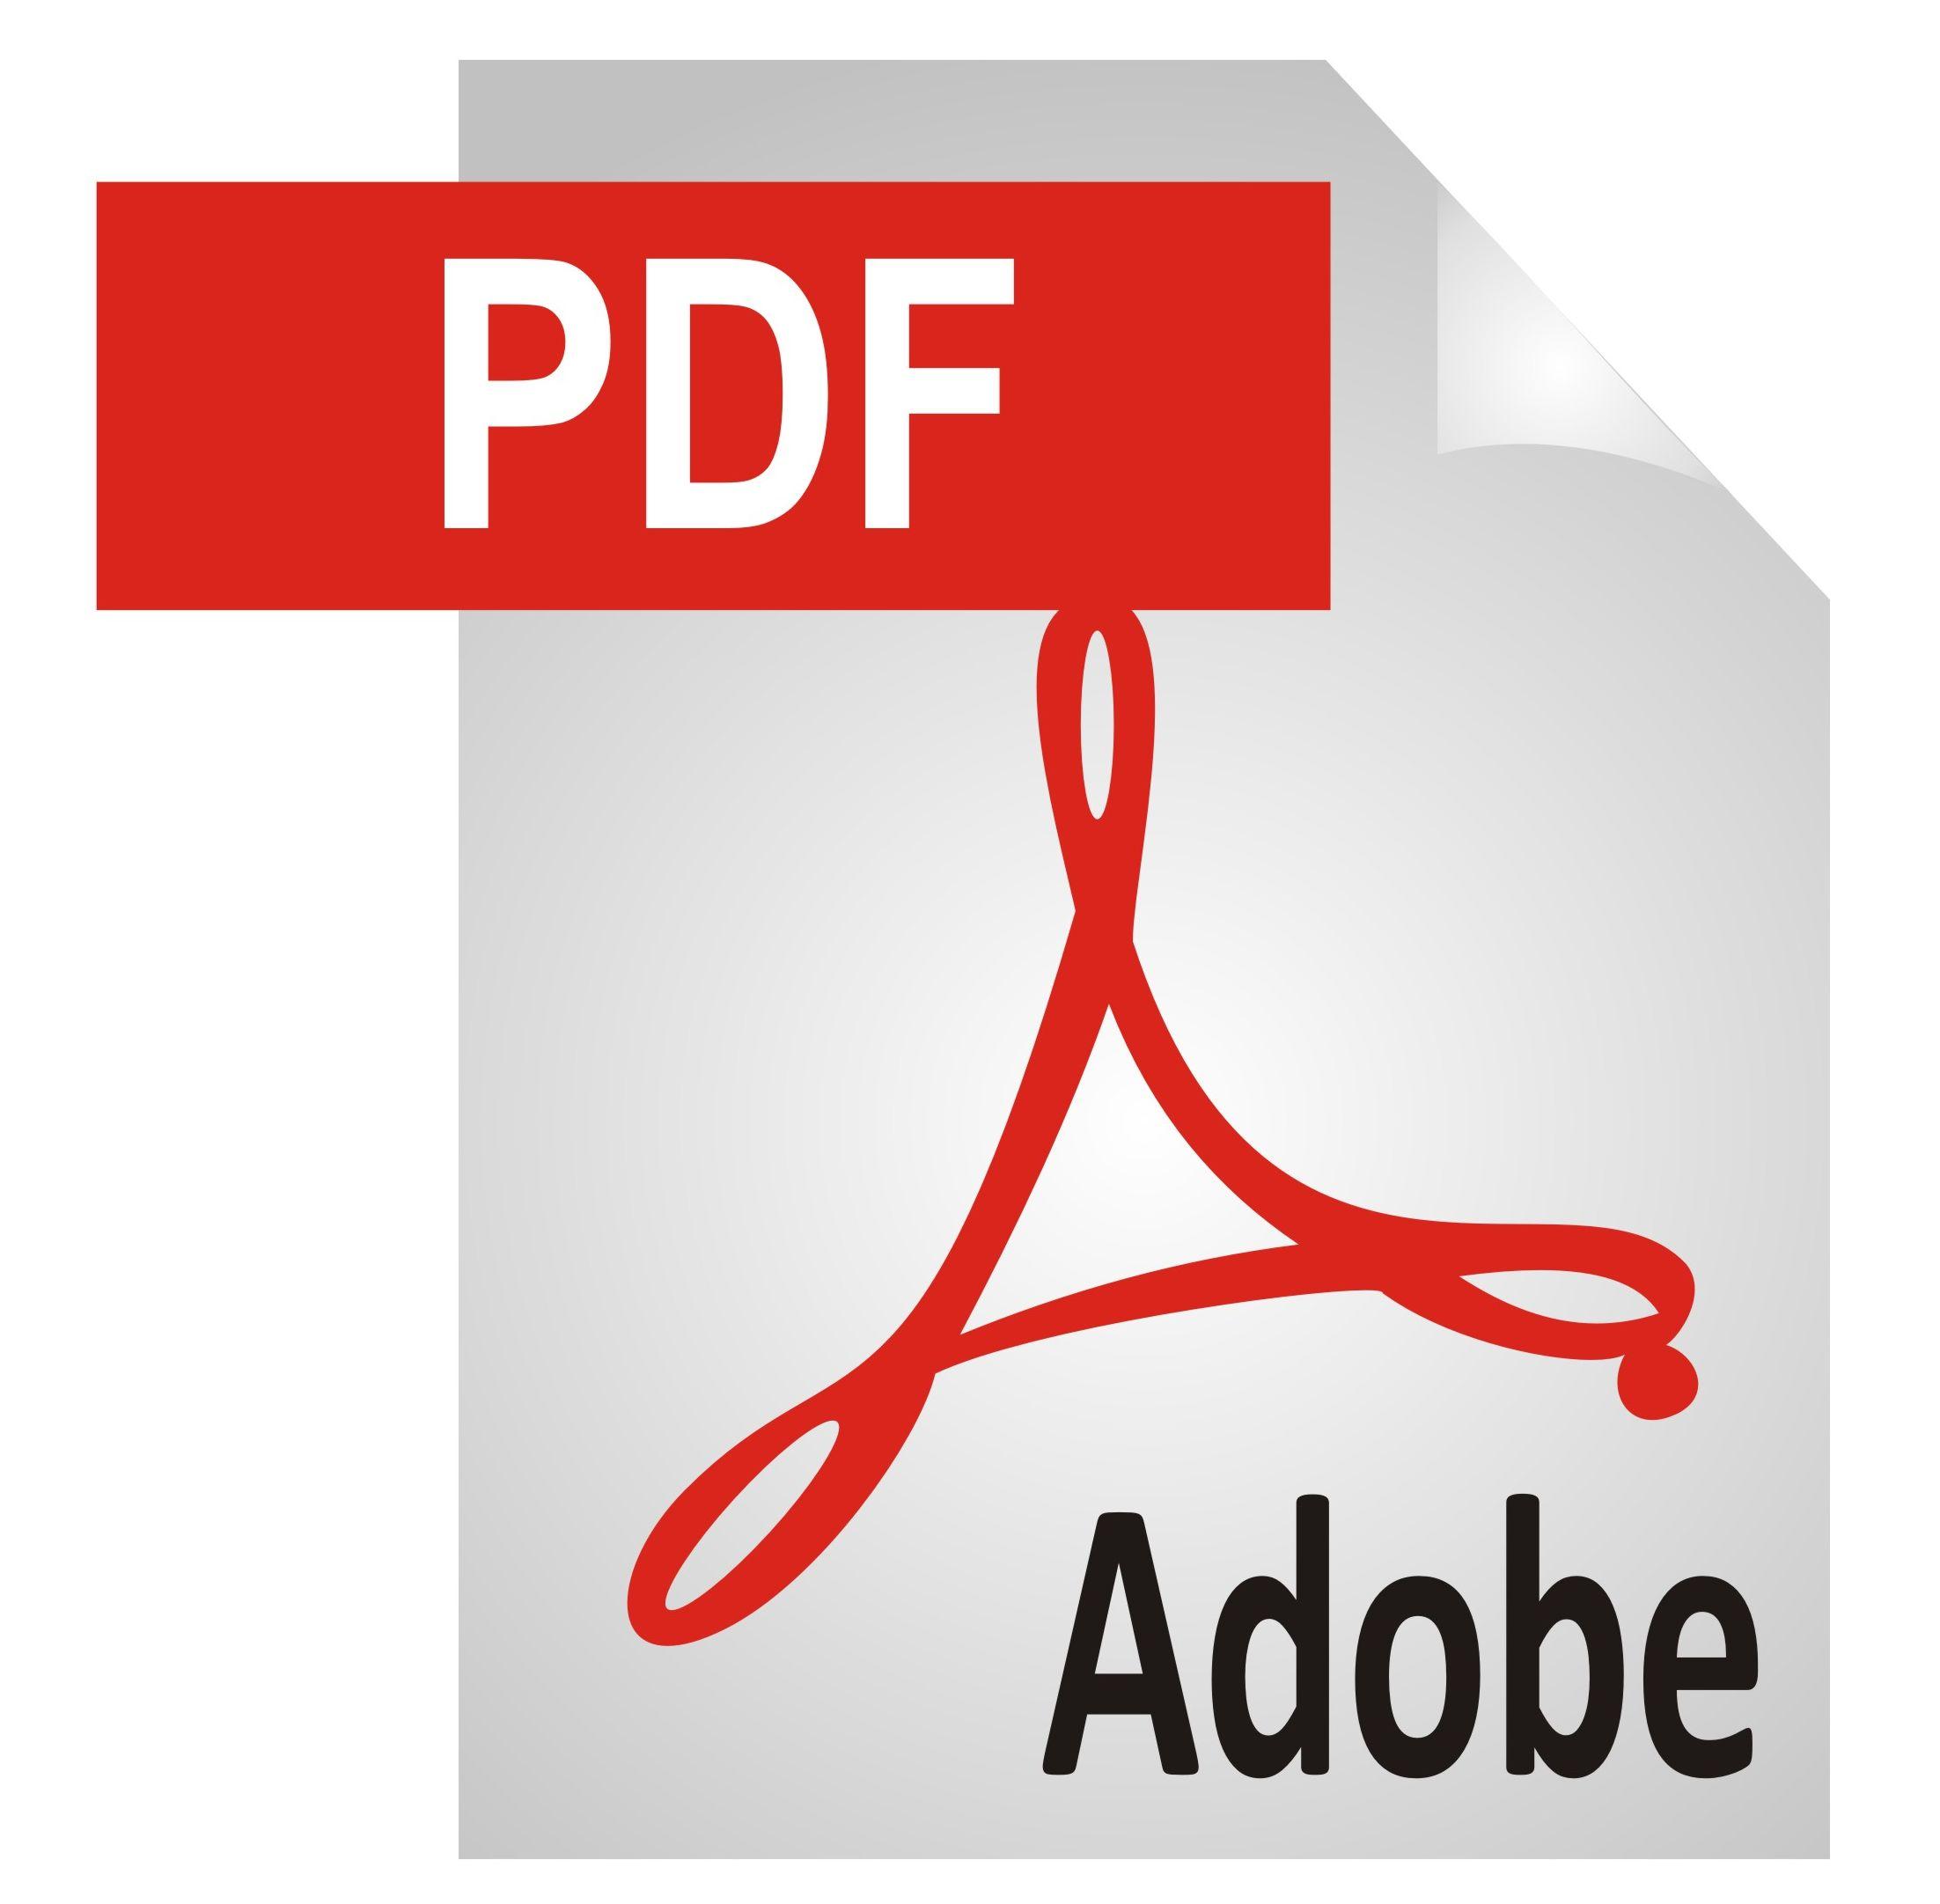 17 Adobe PDF Document Icon Images